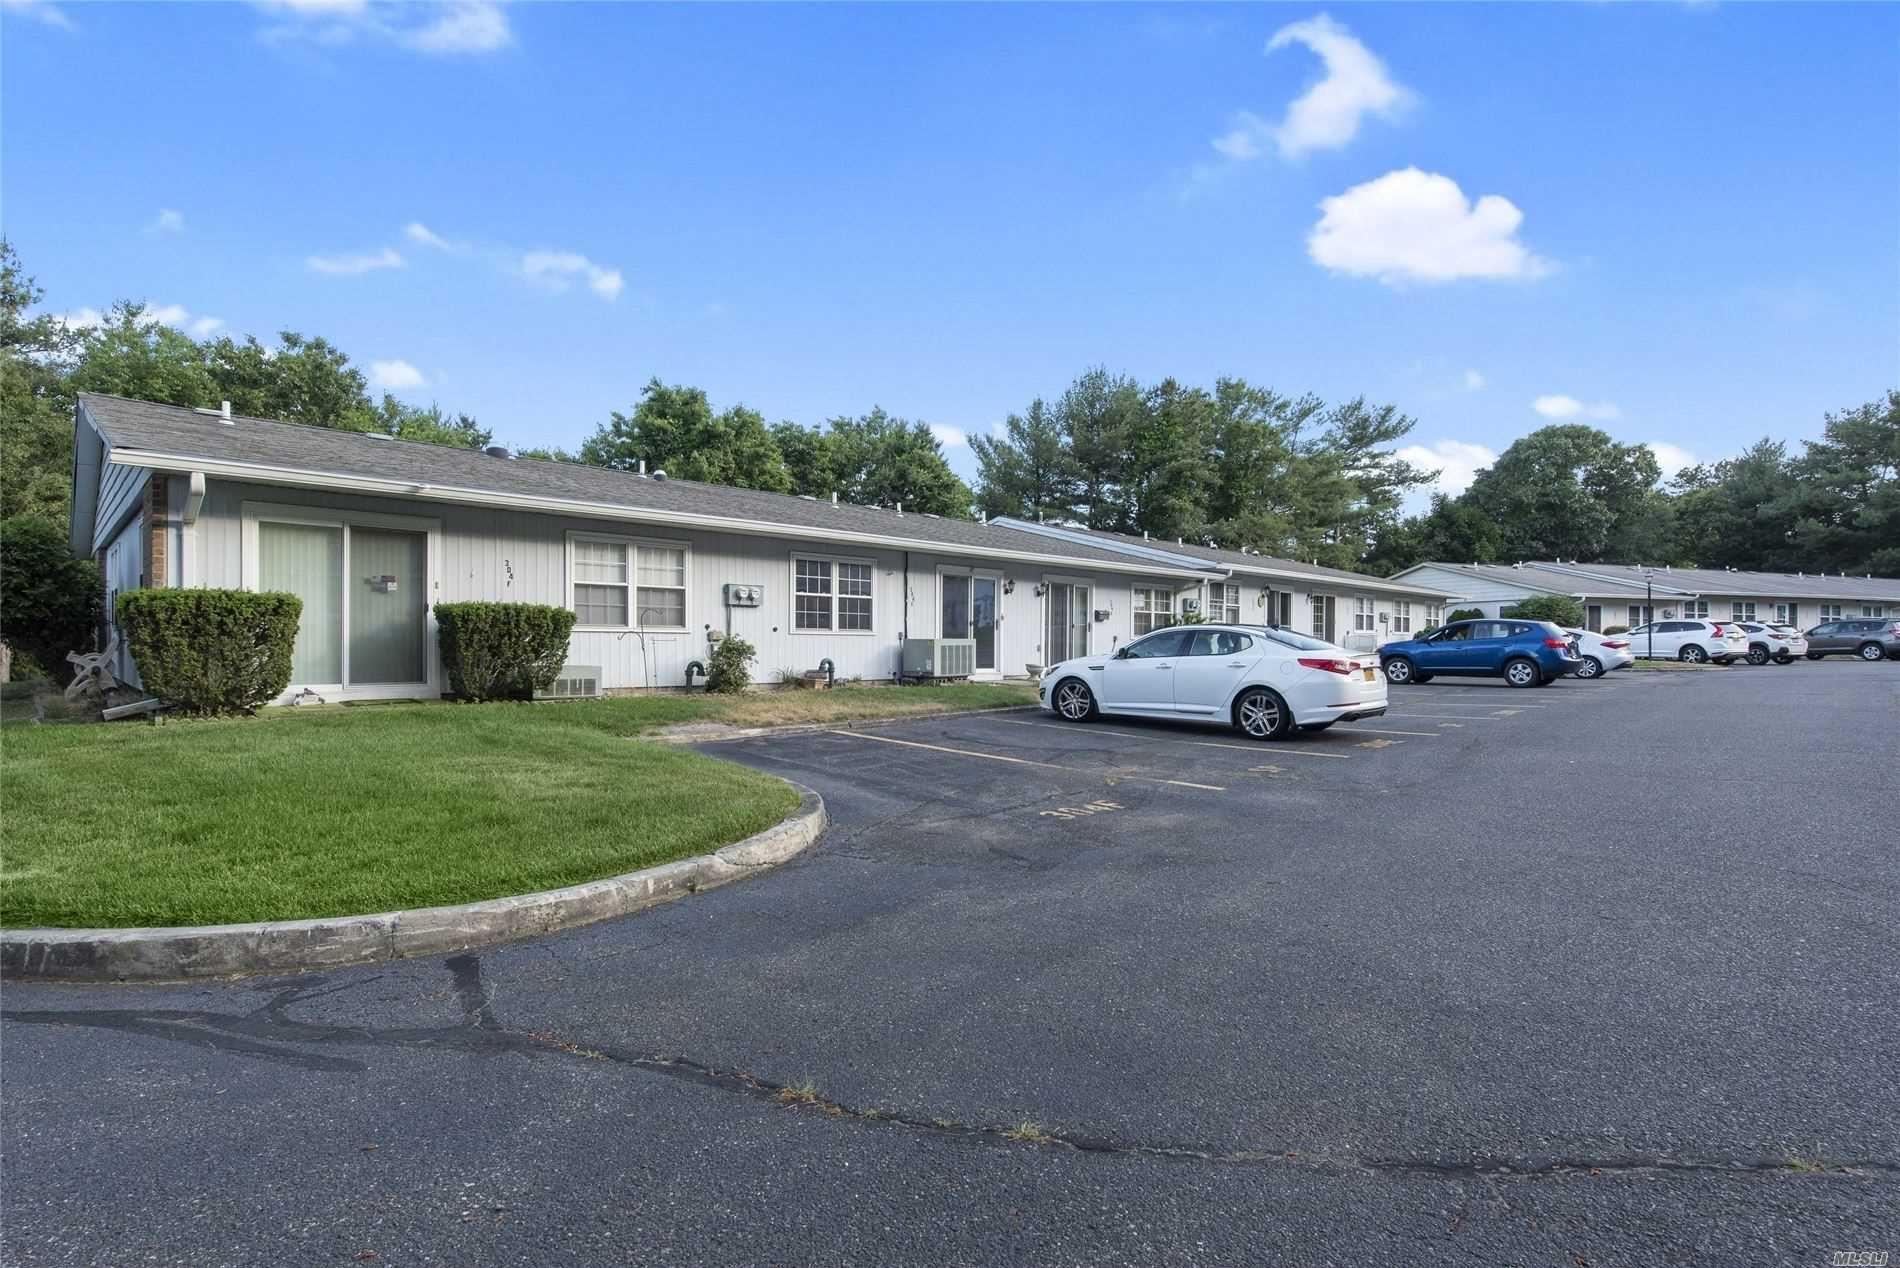 304 Torquay Court, Ridge, NY 11961 - MLS#: 3223911